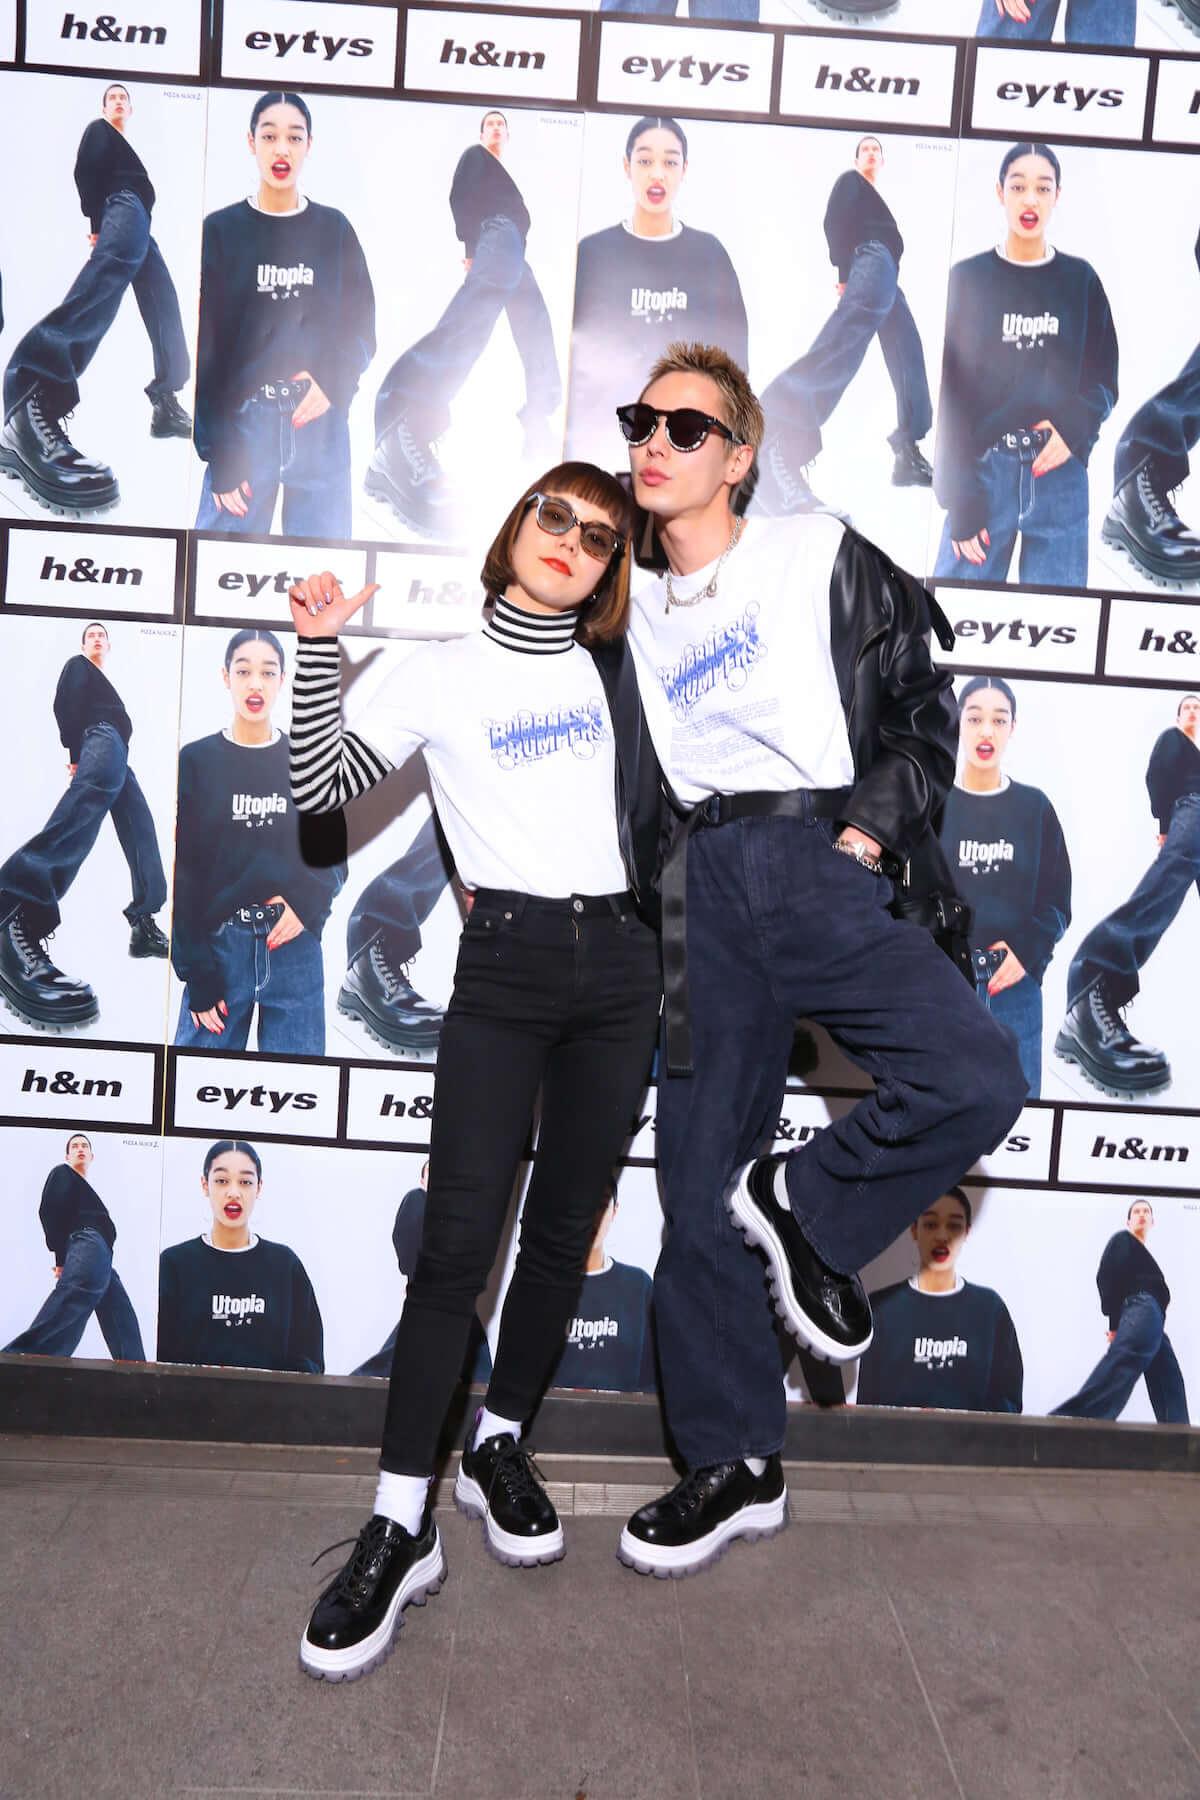 Eytys×H&Mのコラボコレクションが本日より発売開始 life-fashion190124-hm-eytys-8-1200x1800